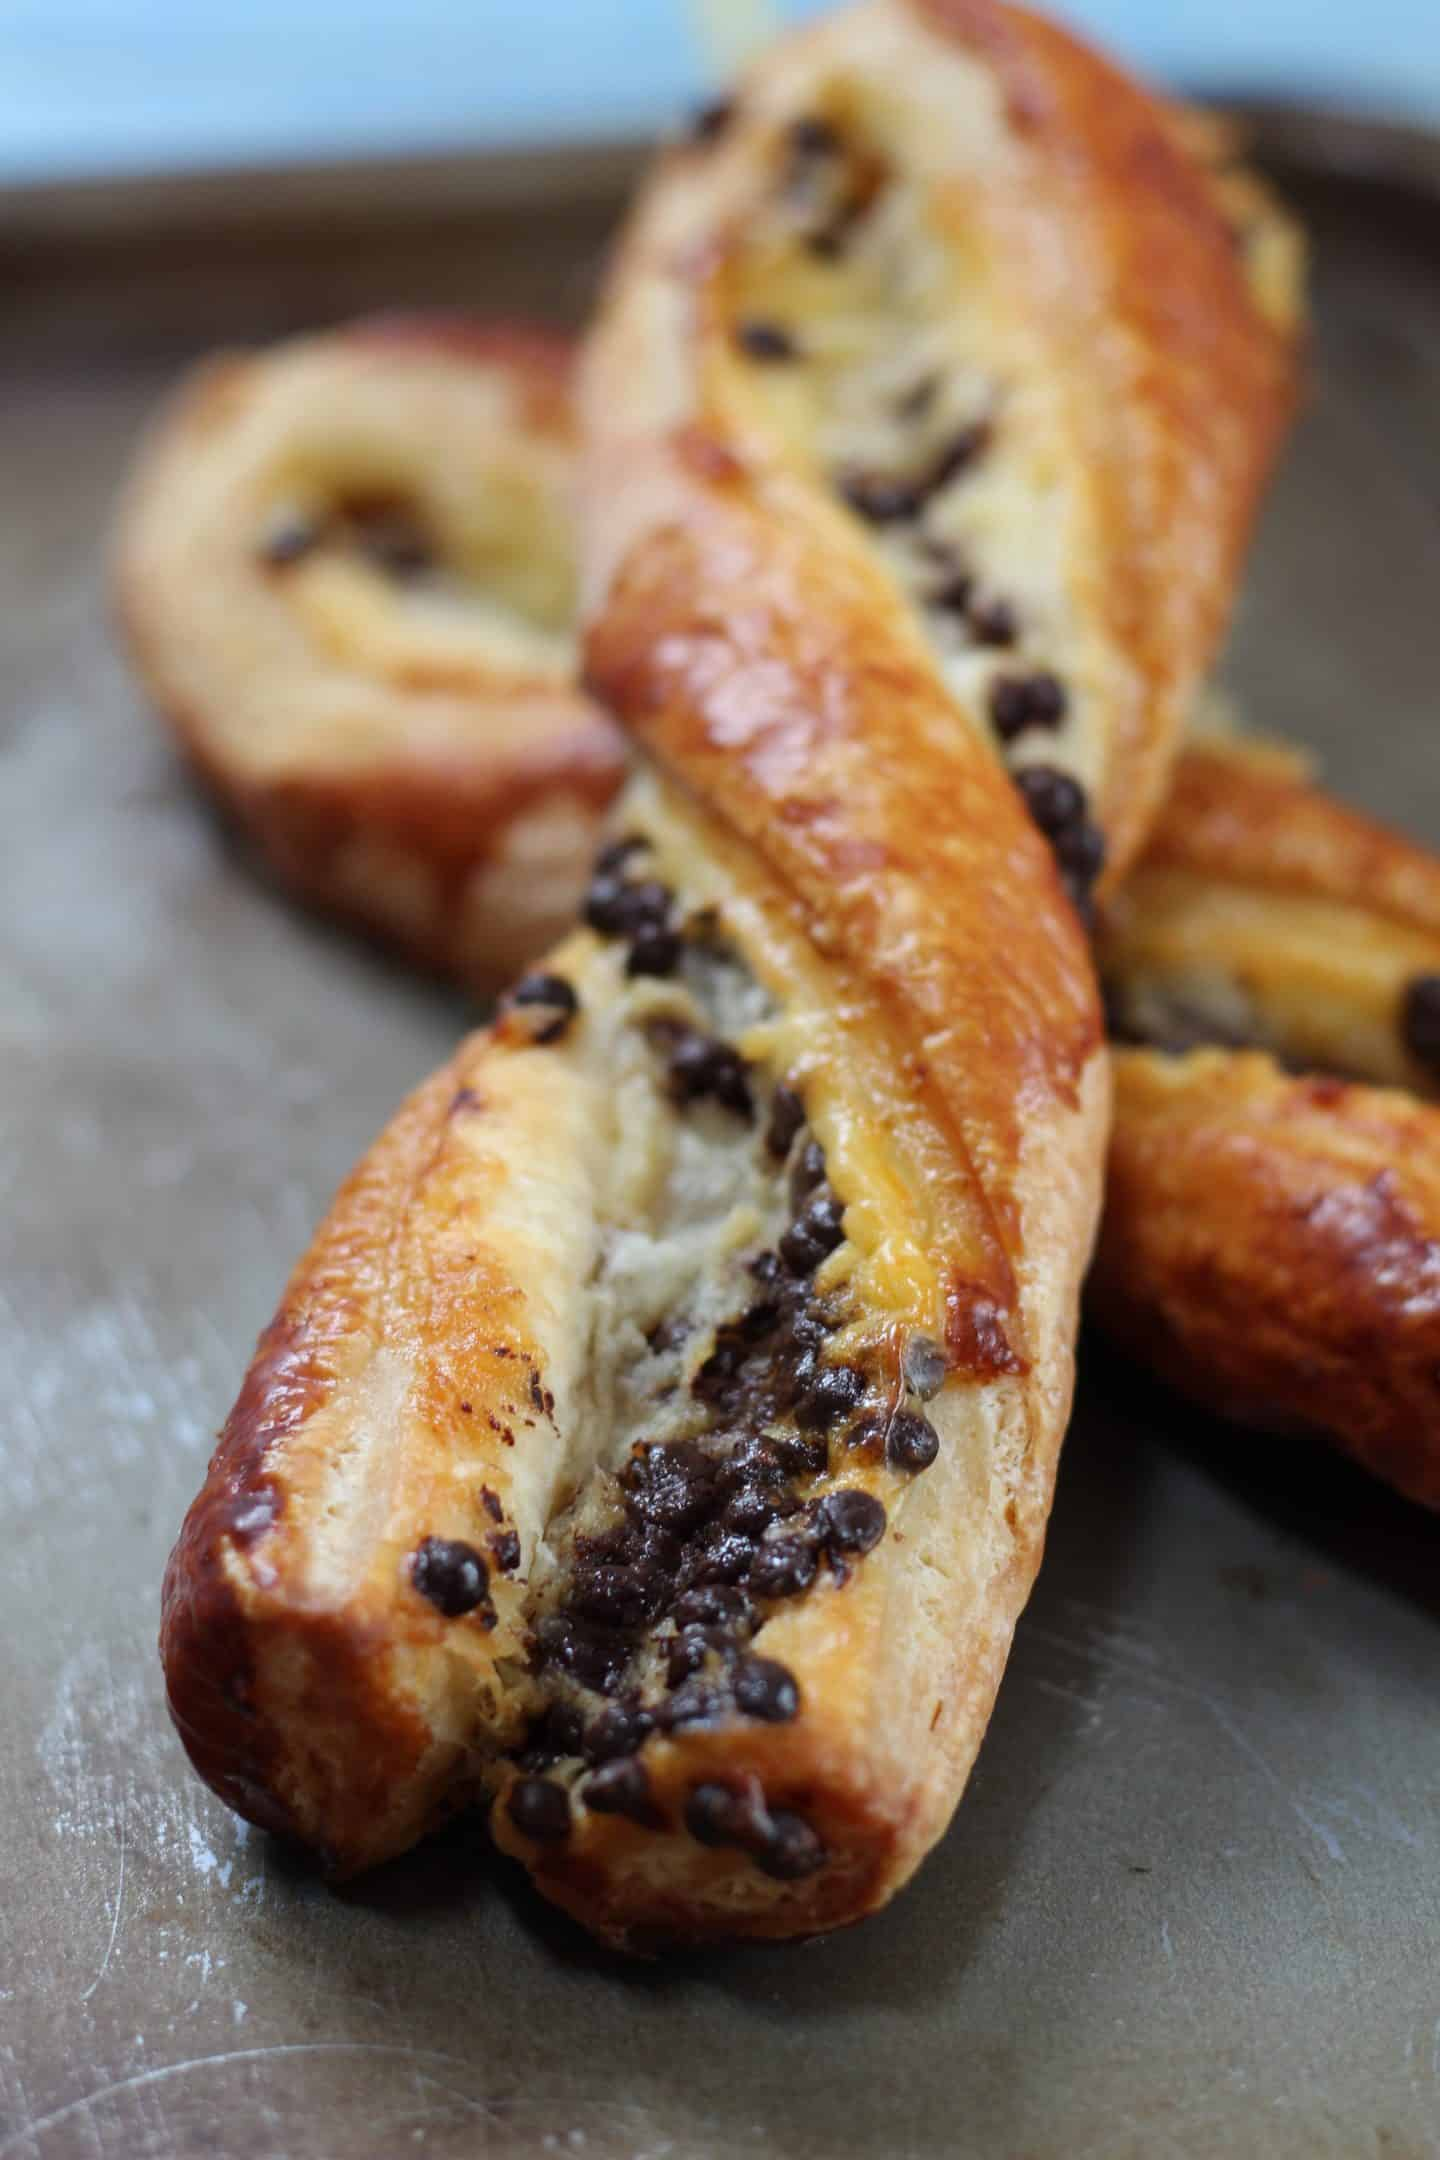 mannadew gluten free bakery london